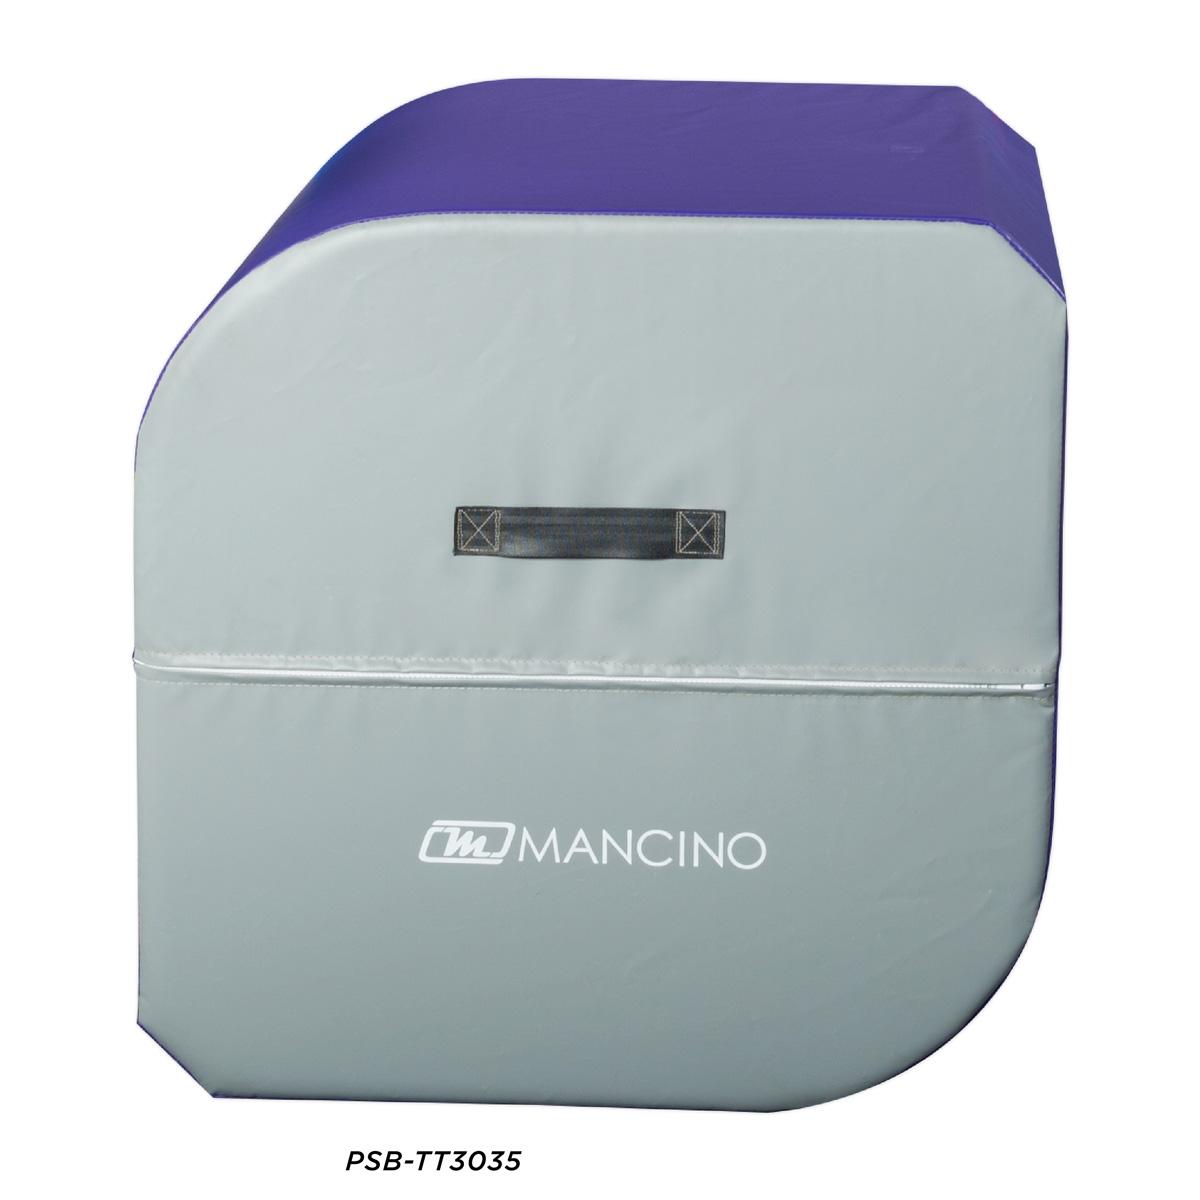 mancino tumble trainers 30x35 for teens cheerleaders and gymnasts